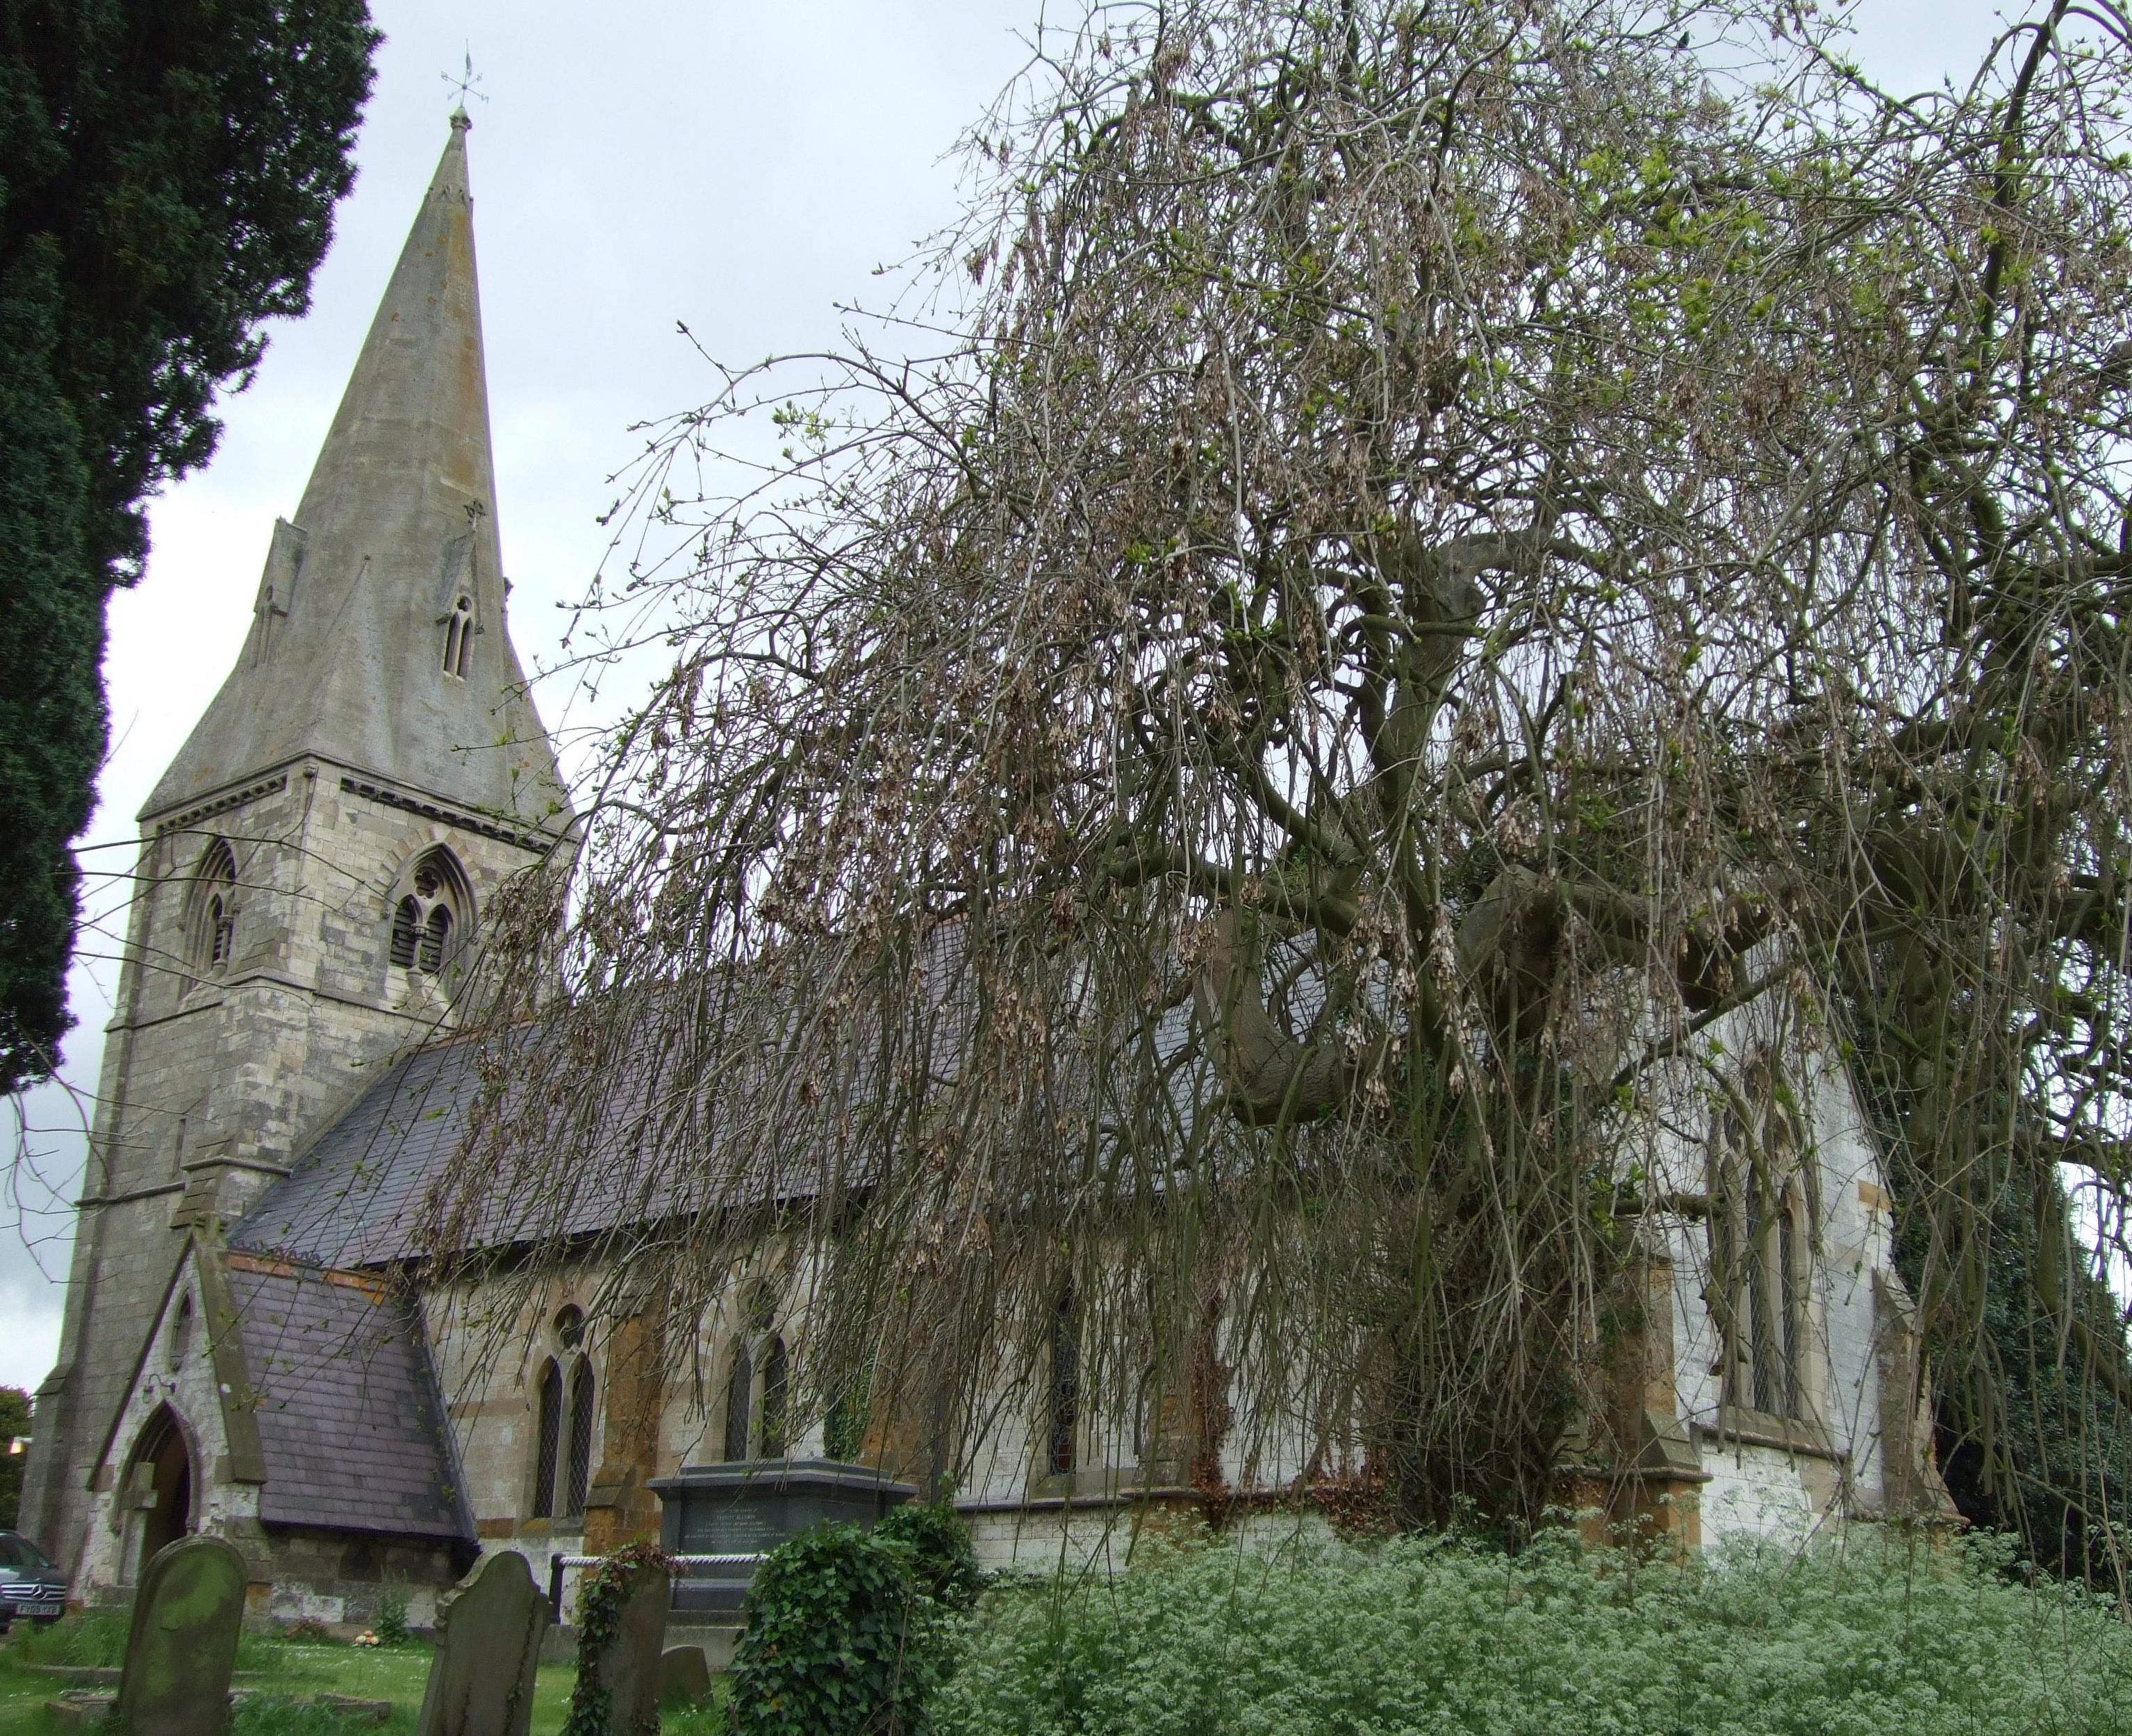 Fotherby church